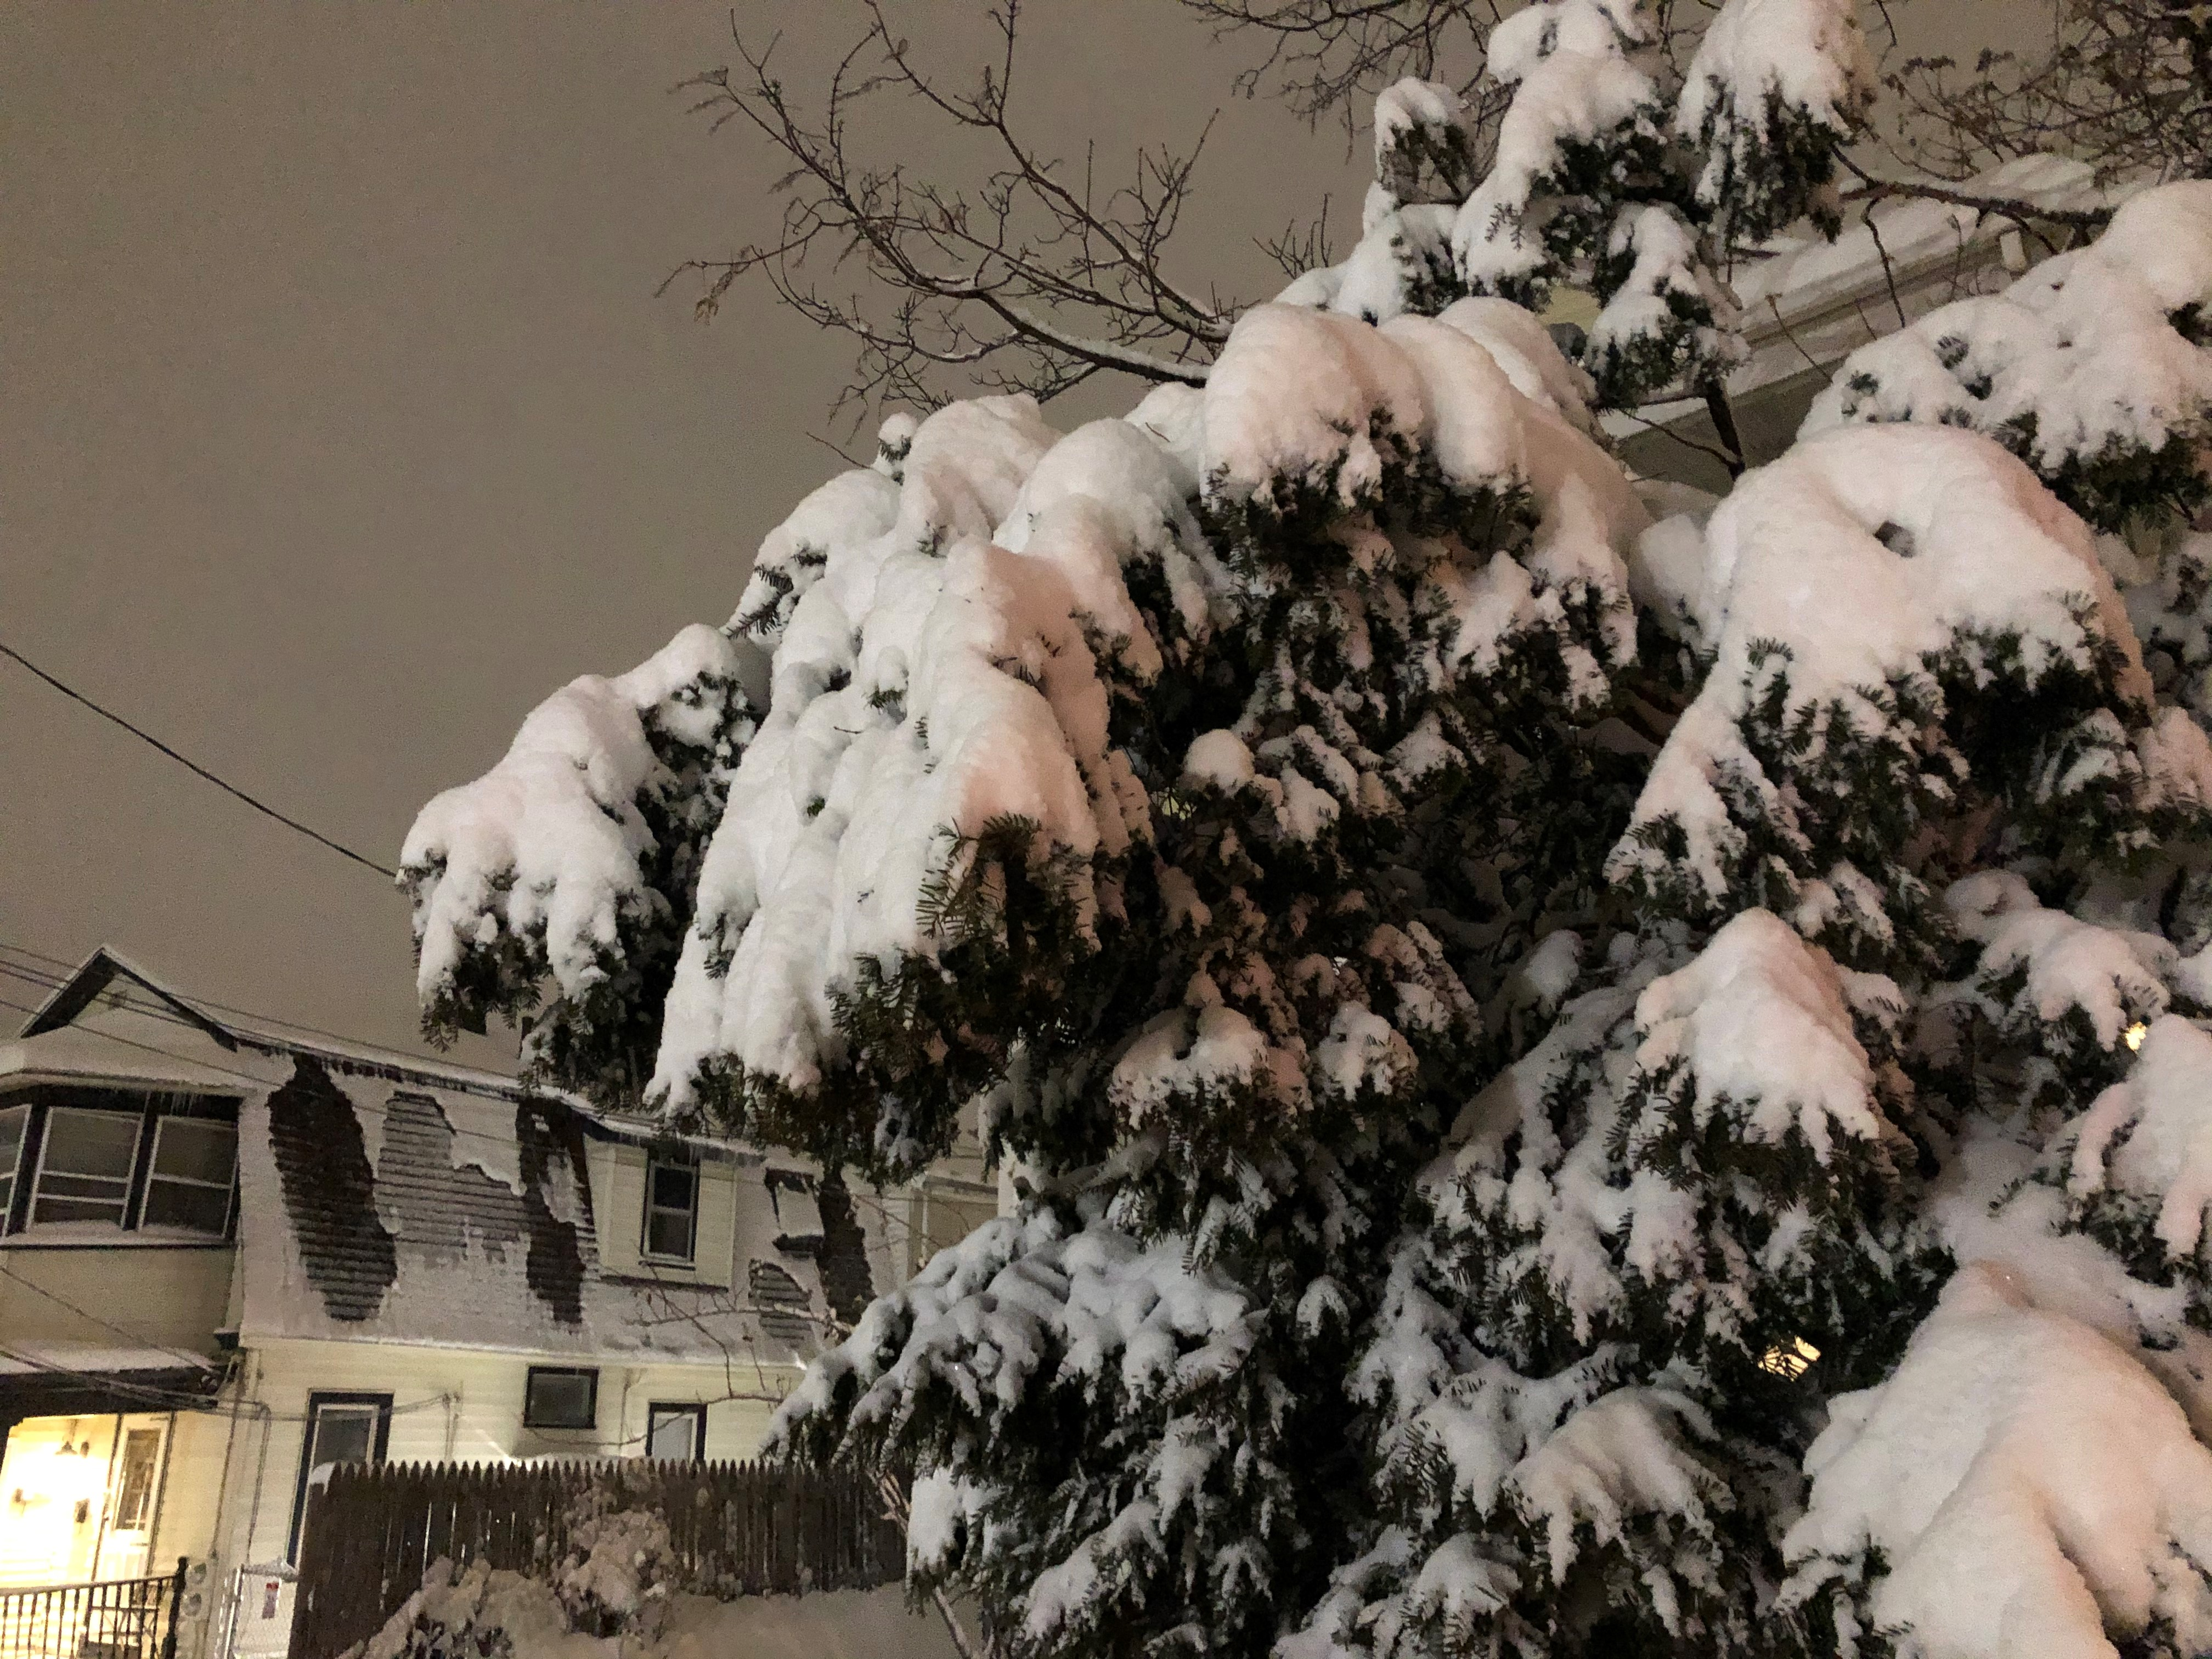 Heavy Burst of Snow Buries Parts of Connecticut